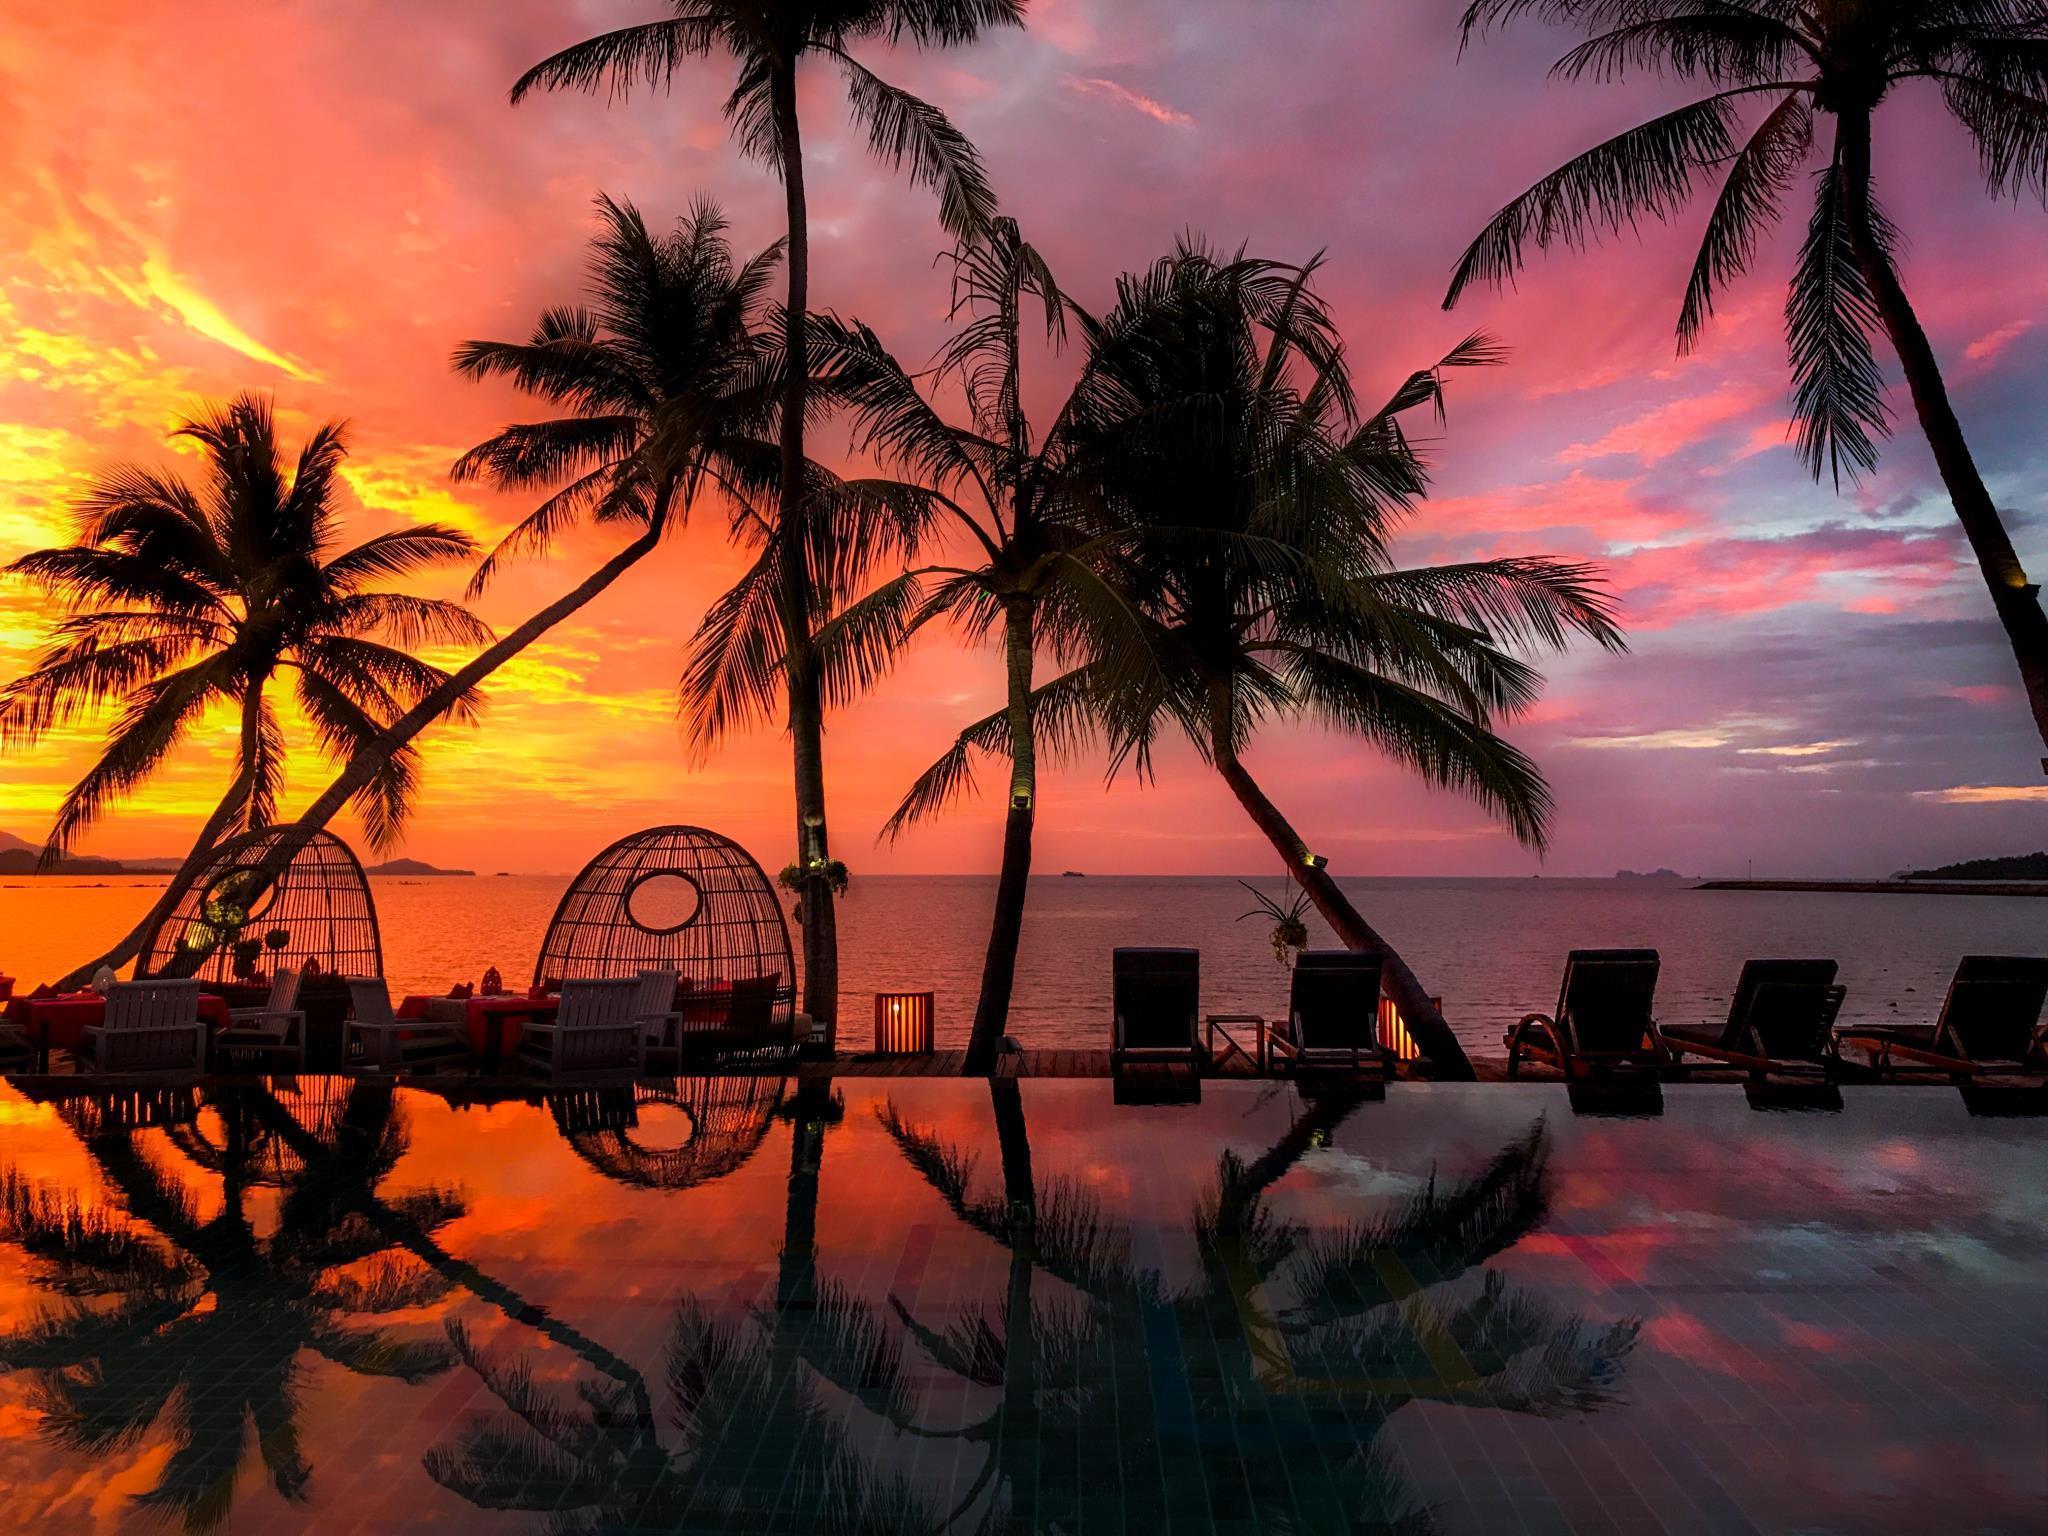 Tango Luxe Samui Beach Villa แทงโก้ ลักซ์ สมุย บีช วิลลา